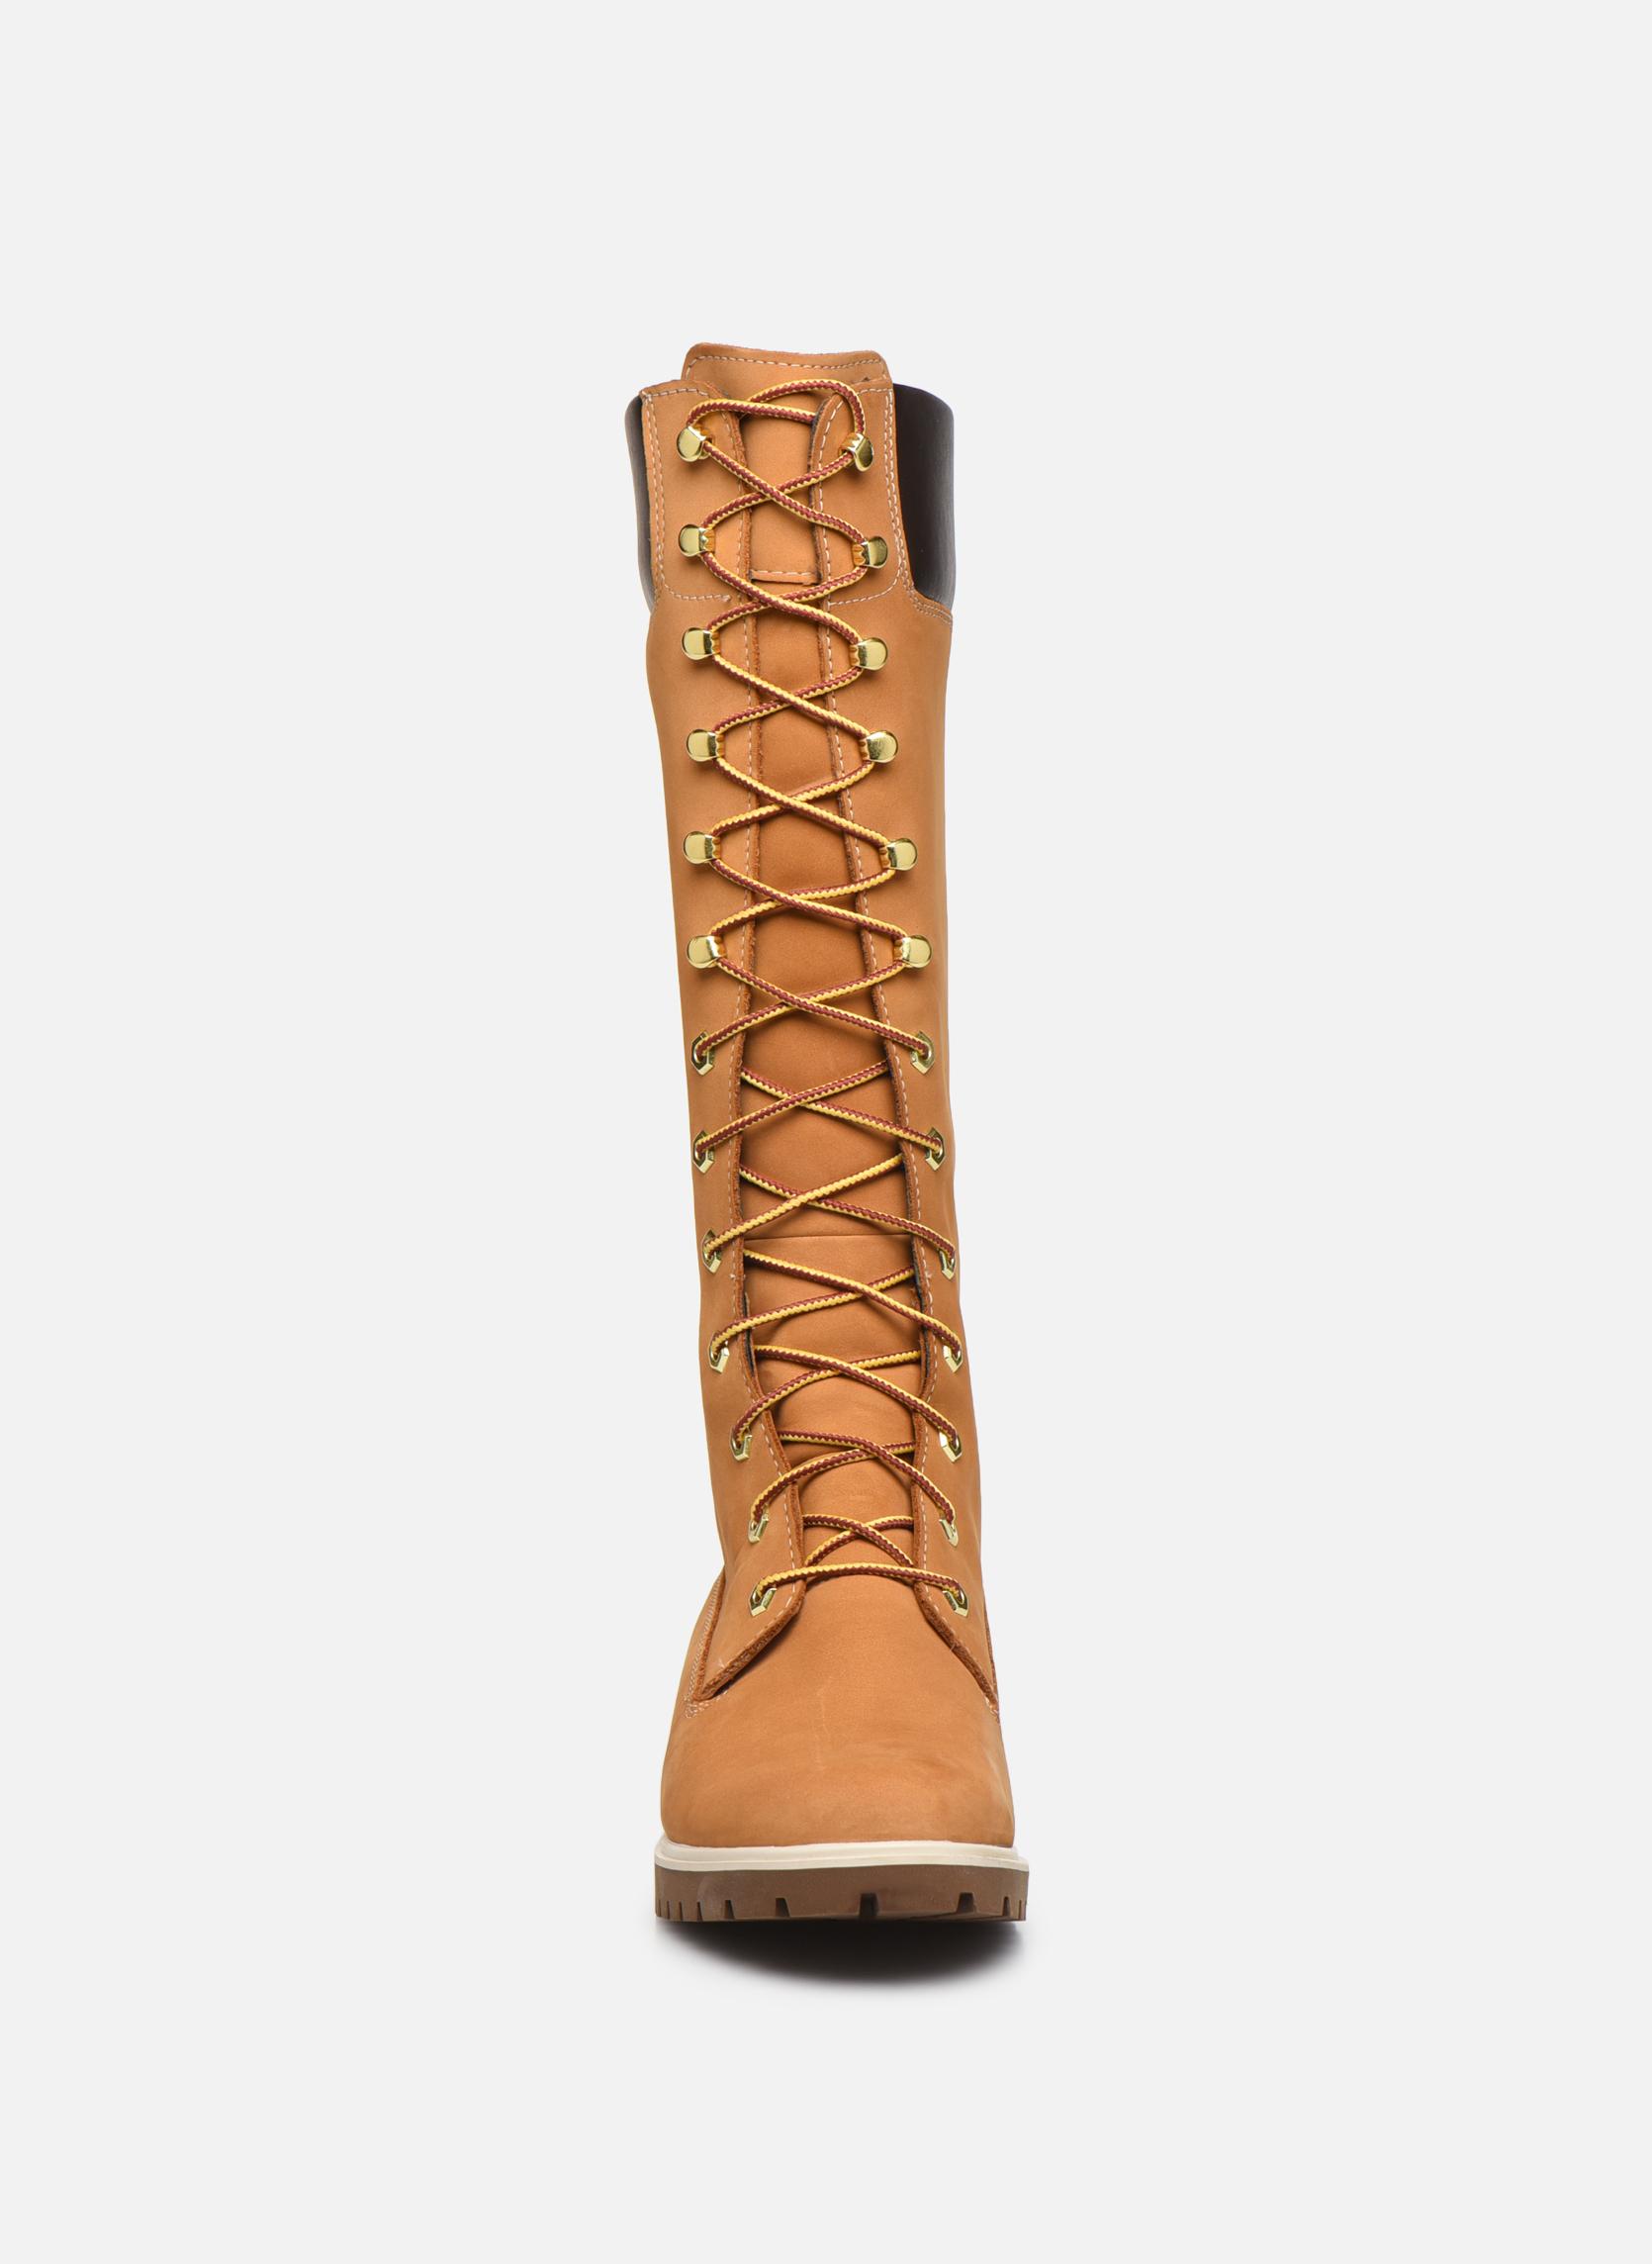 Bottes Timberland Women's Premium 14 inch Jaune vue portées chaussures